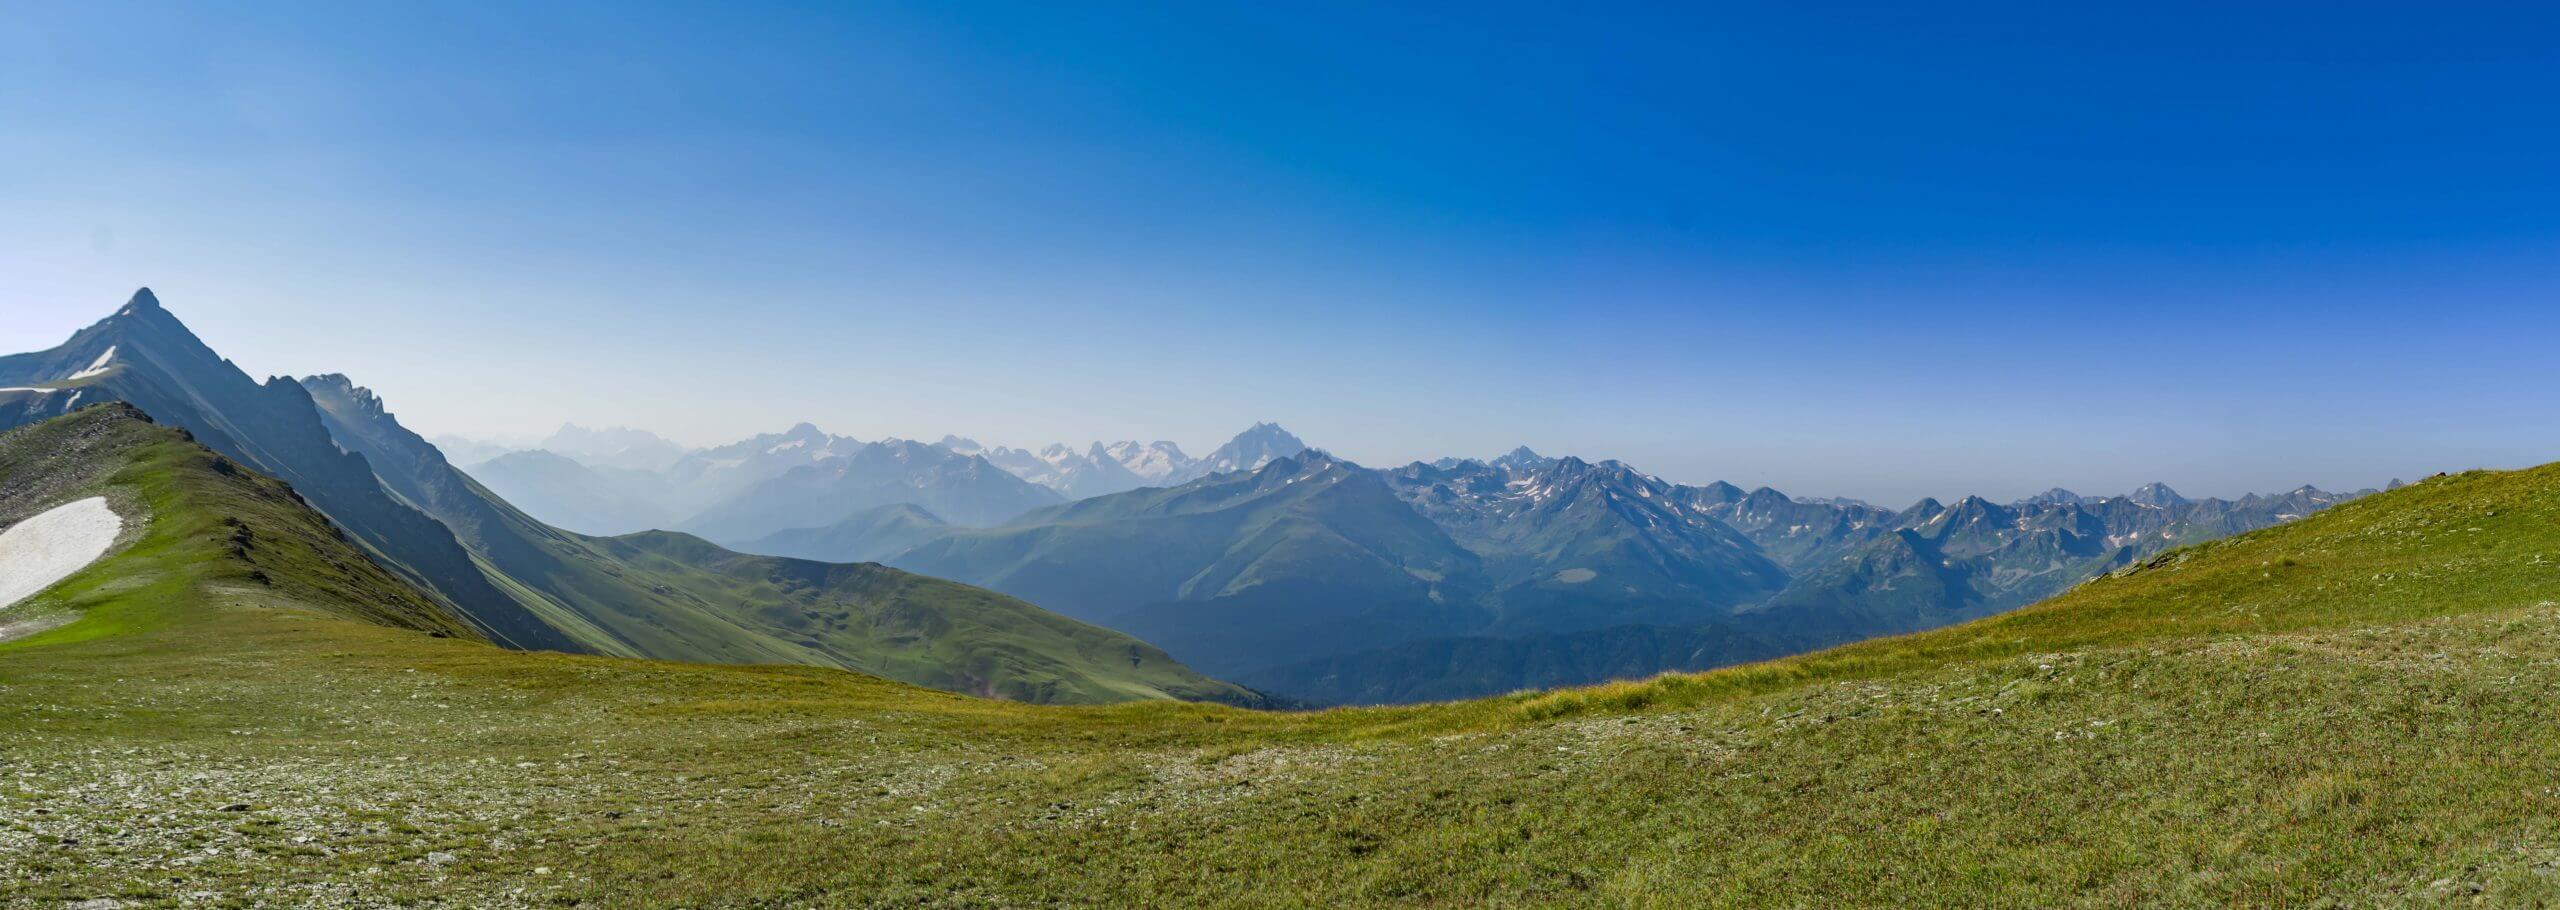 Панорама с перевала Речепста